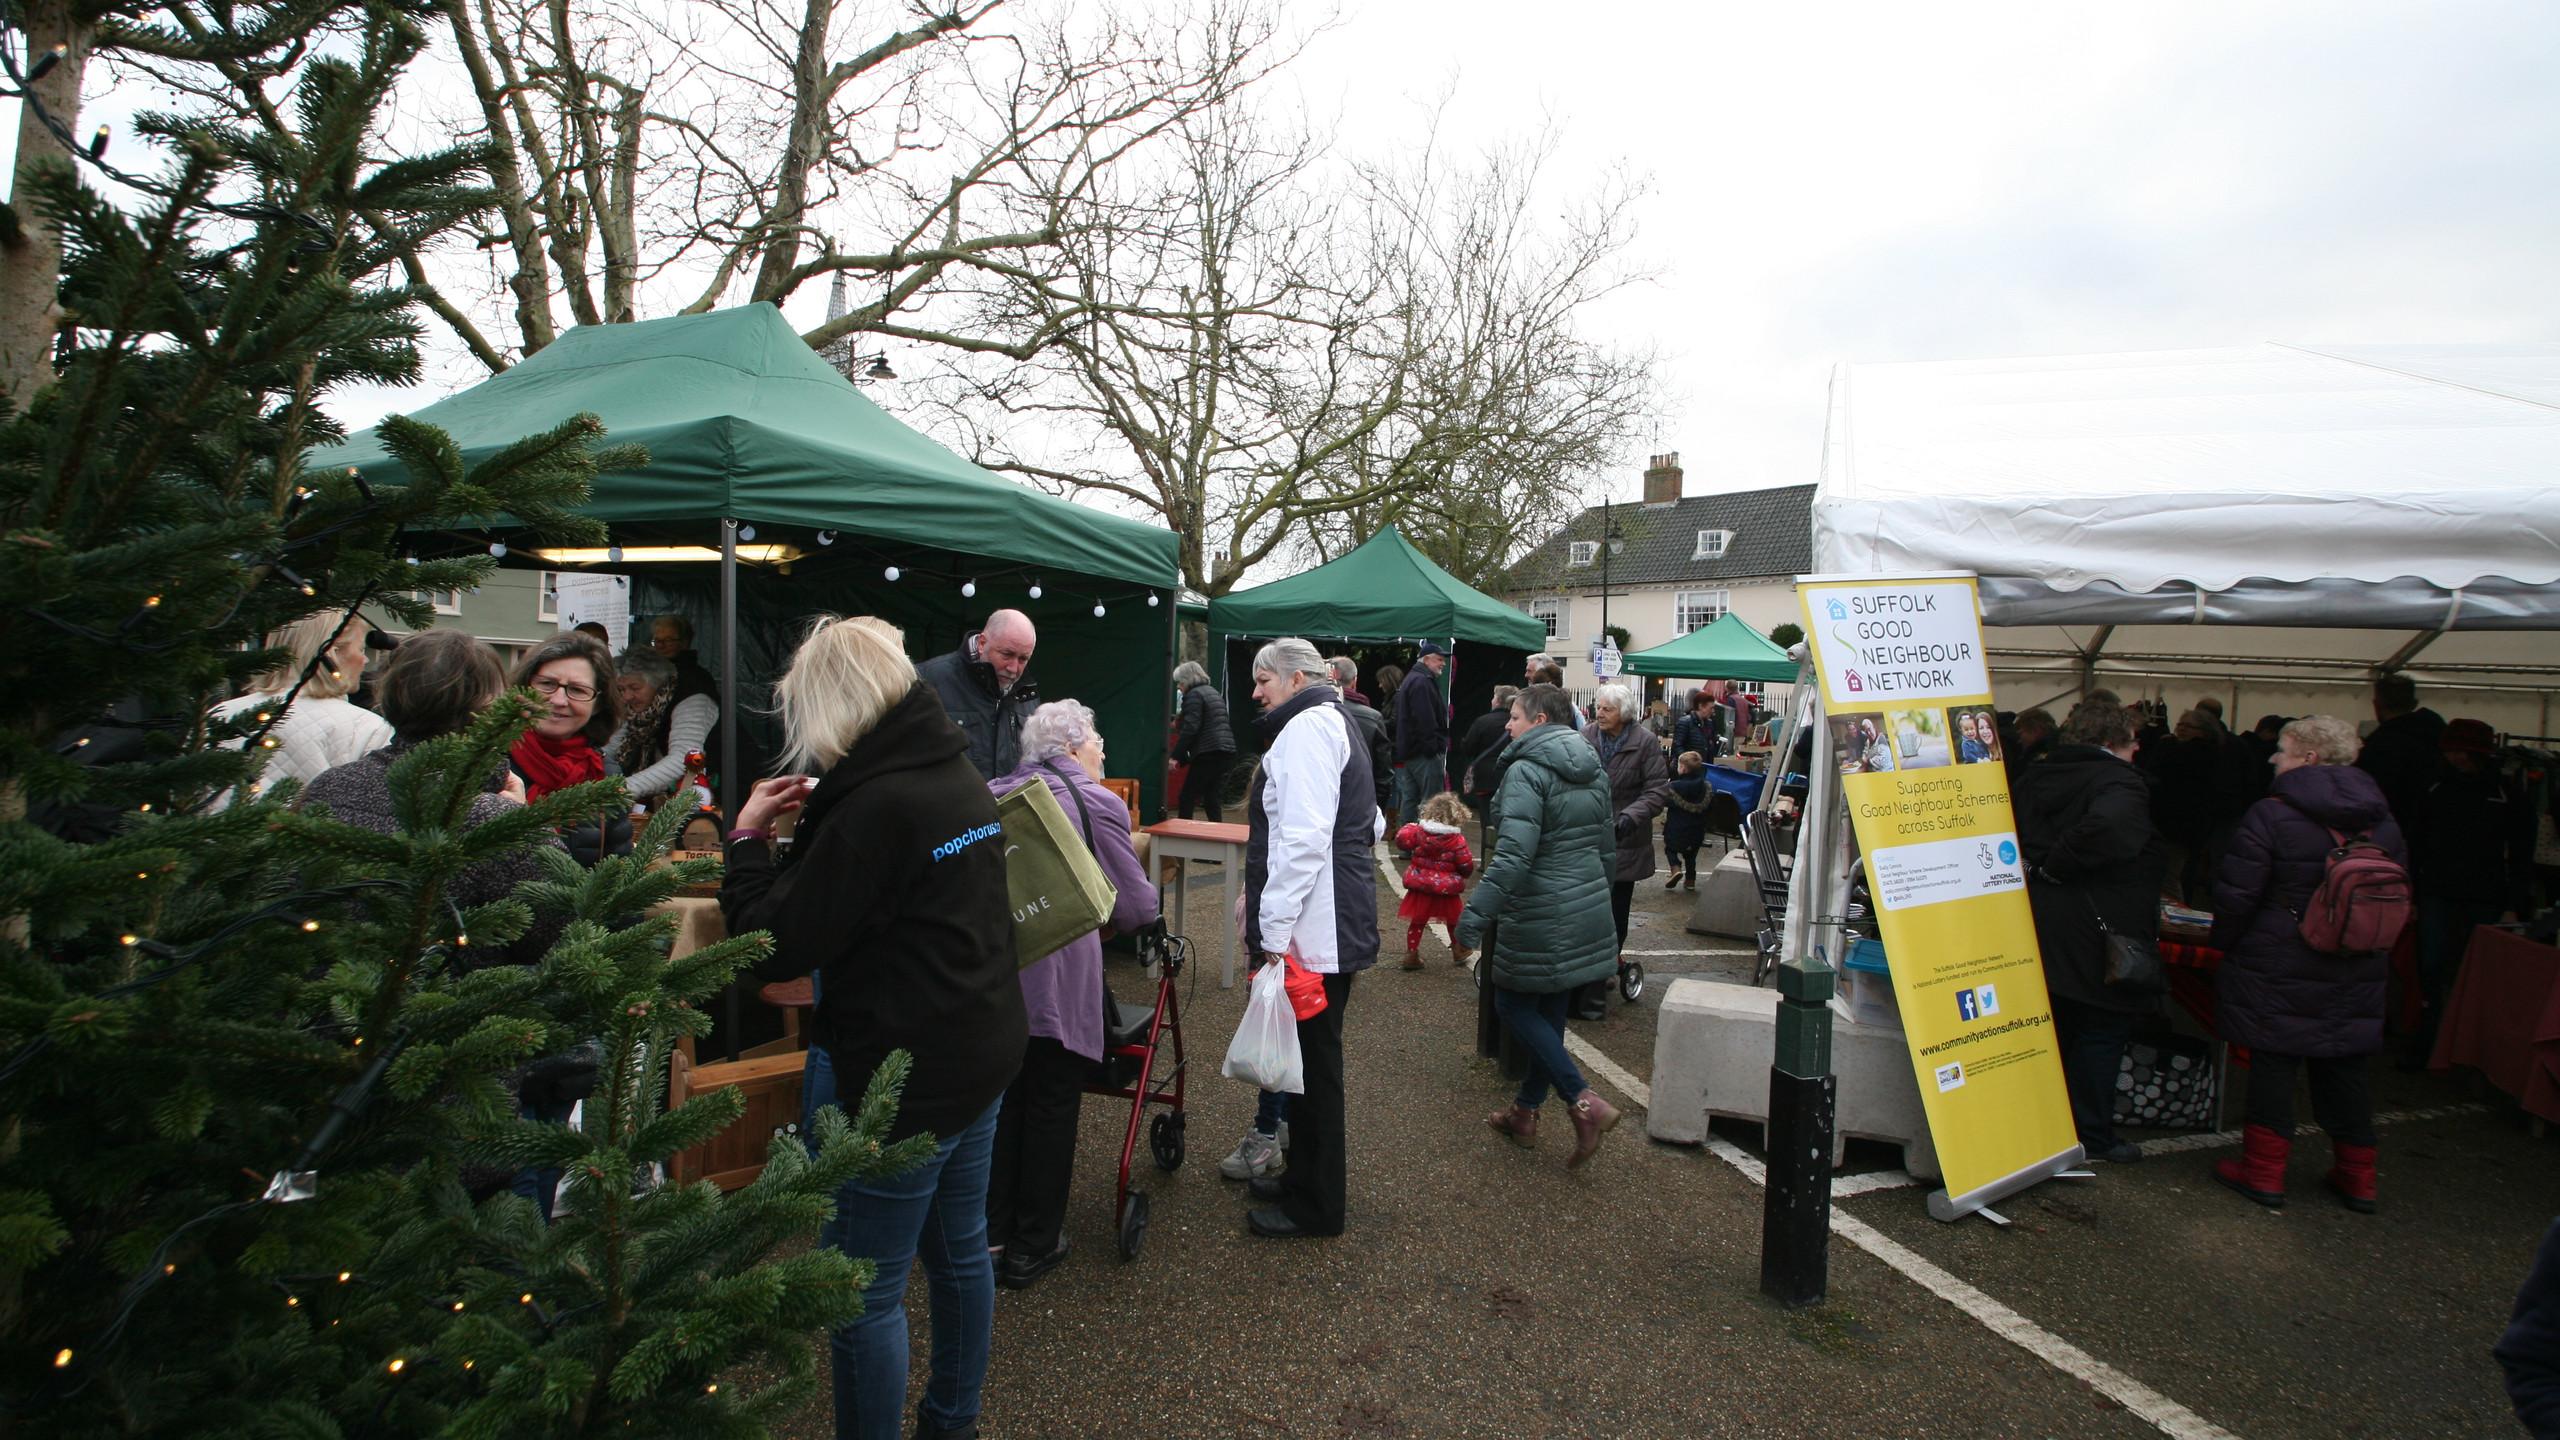 The Market Christmas